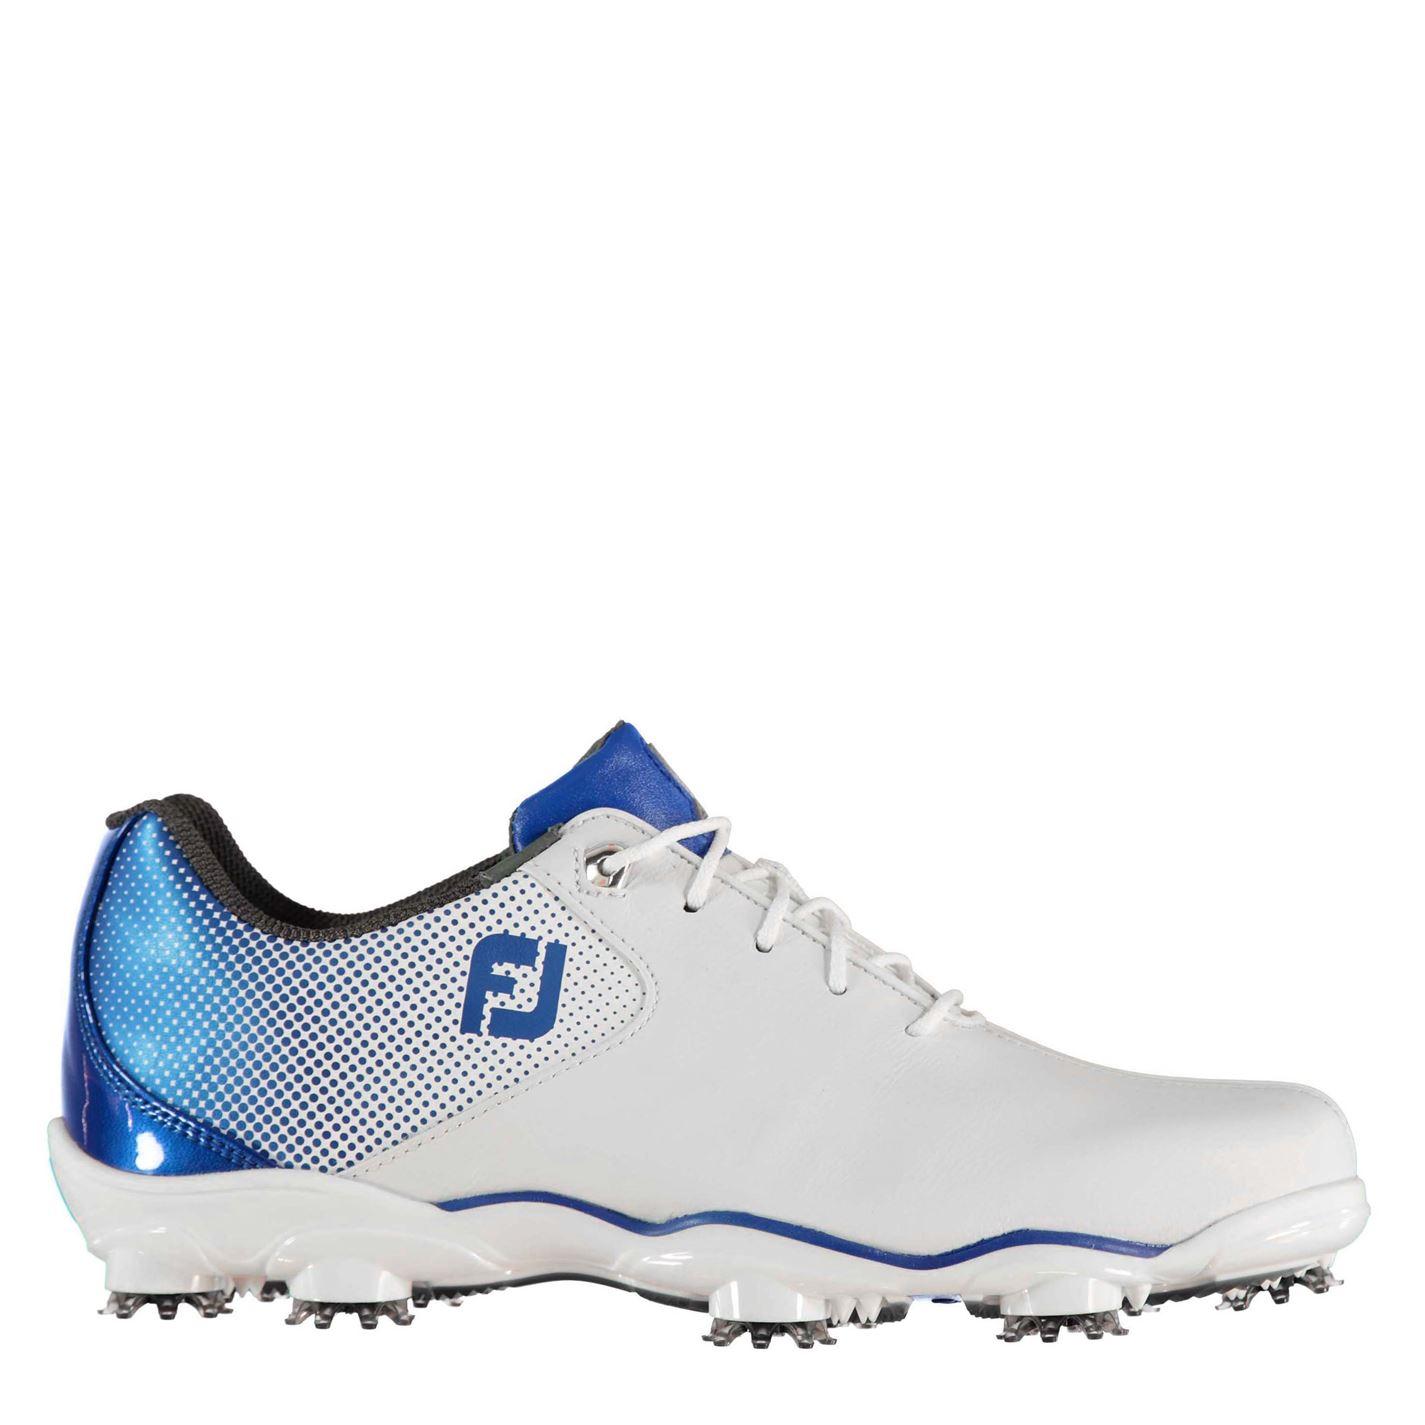 Pantofi de Golf Footjoy DNA Helix pentru Barbati alb albastru